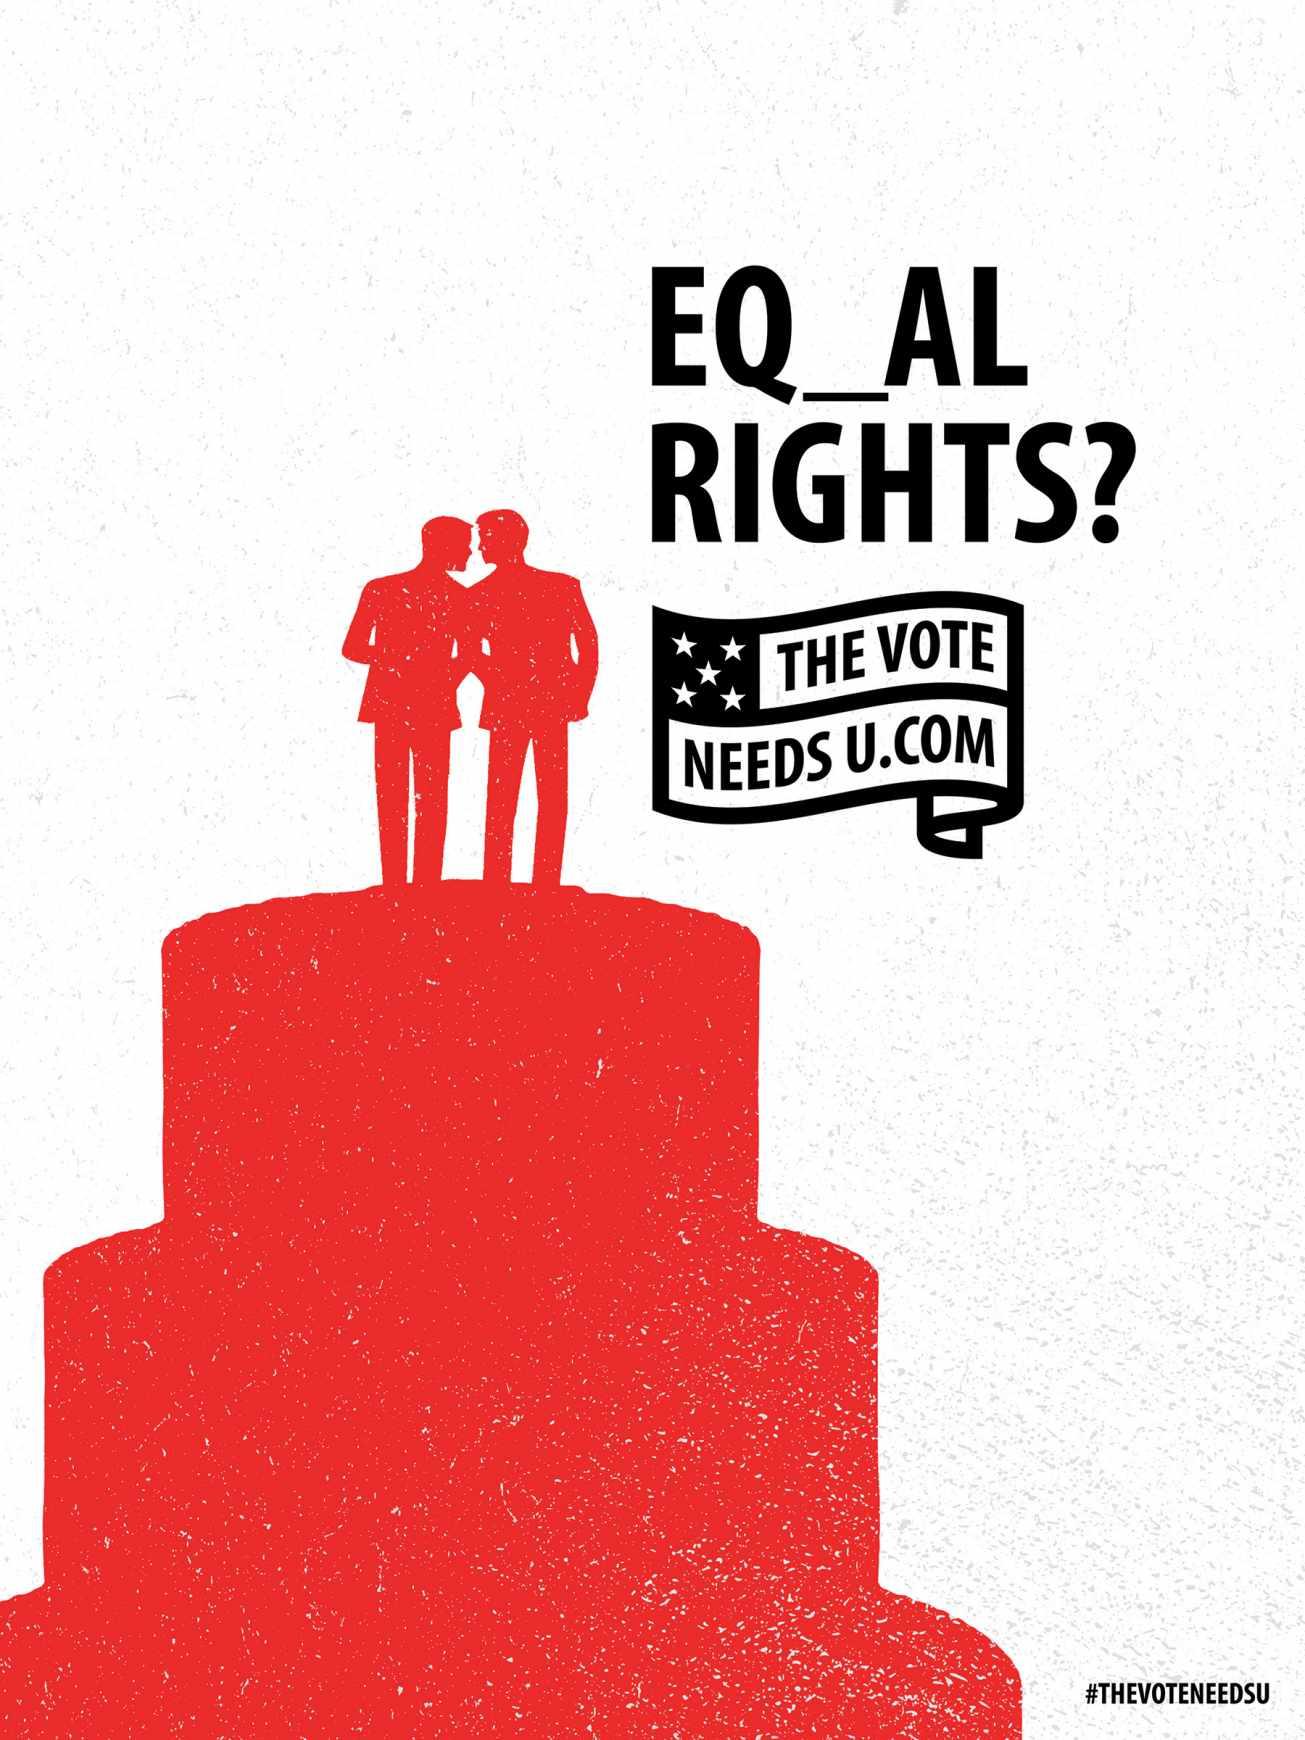 TheVoteNeedsU Print Ad - EQ_AL RIGHTS?